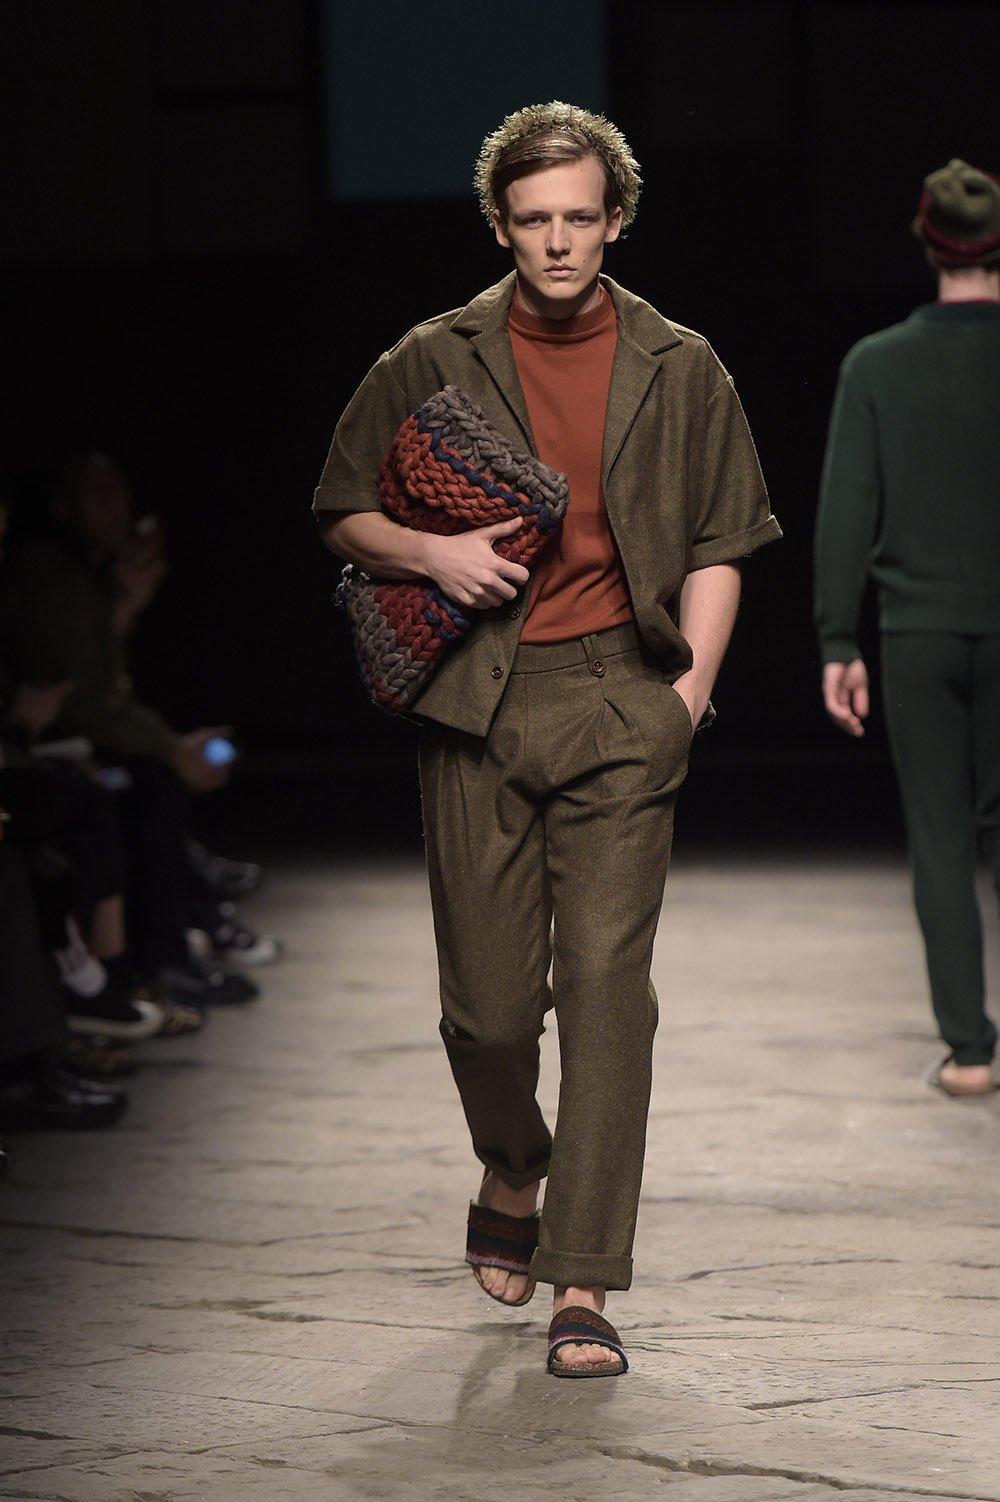 griot-mag-generation-africa-pitti-ethical-fashion-Lukhanyo Mdingi x Nicholas Coutts © Giovanni Giannoni-3